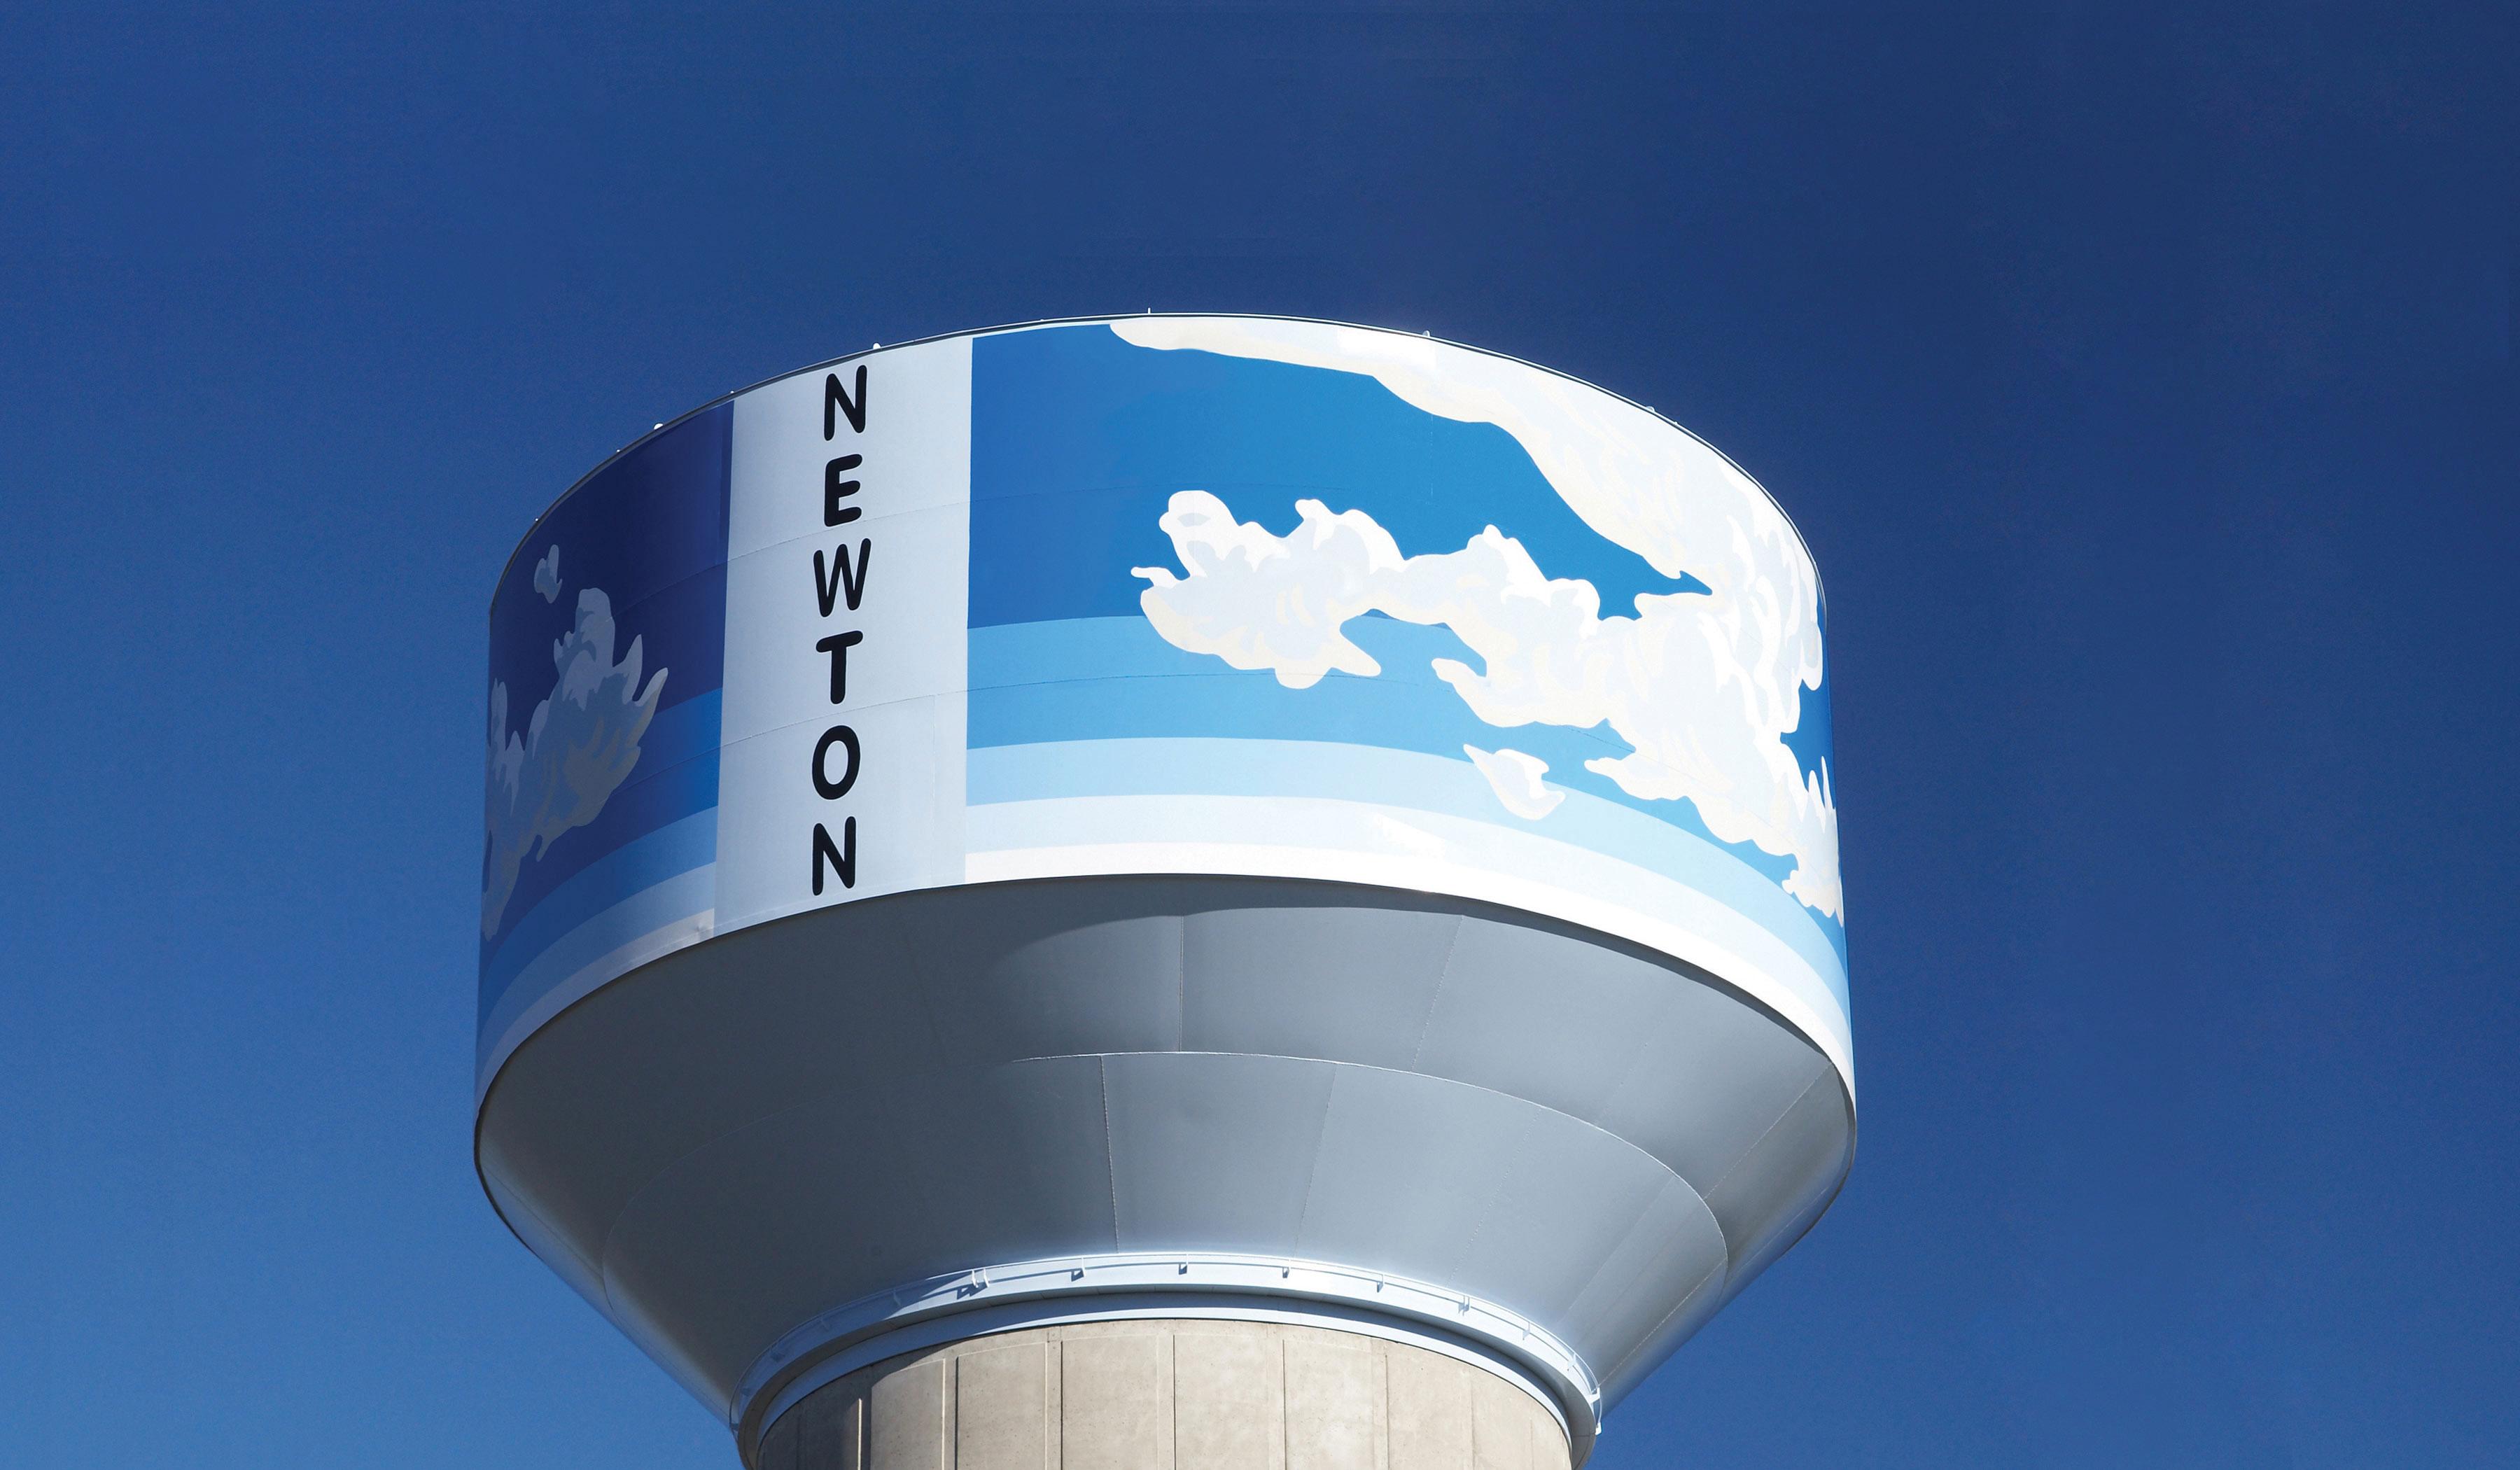 Newton, Kansas, Water Tank, Tnemec Company, Hydroflon Series 700, Lumiflon FEVE